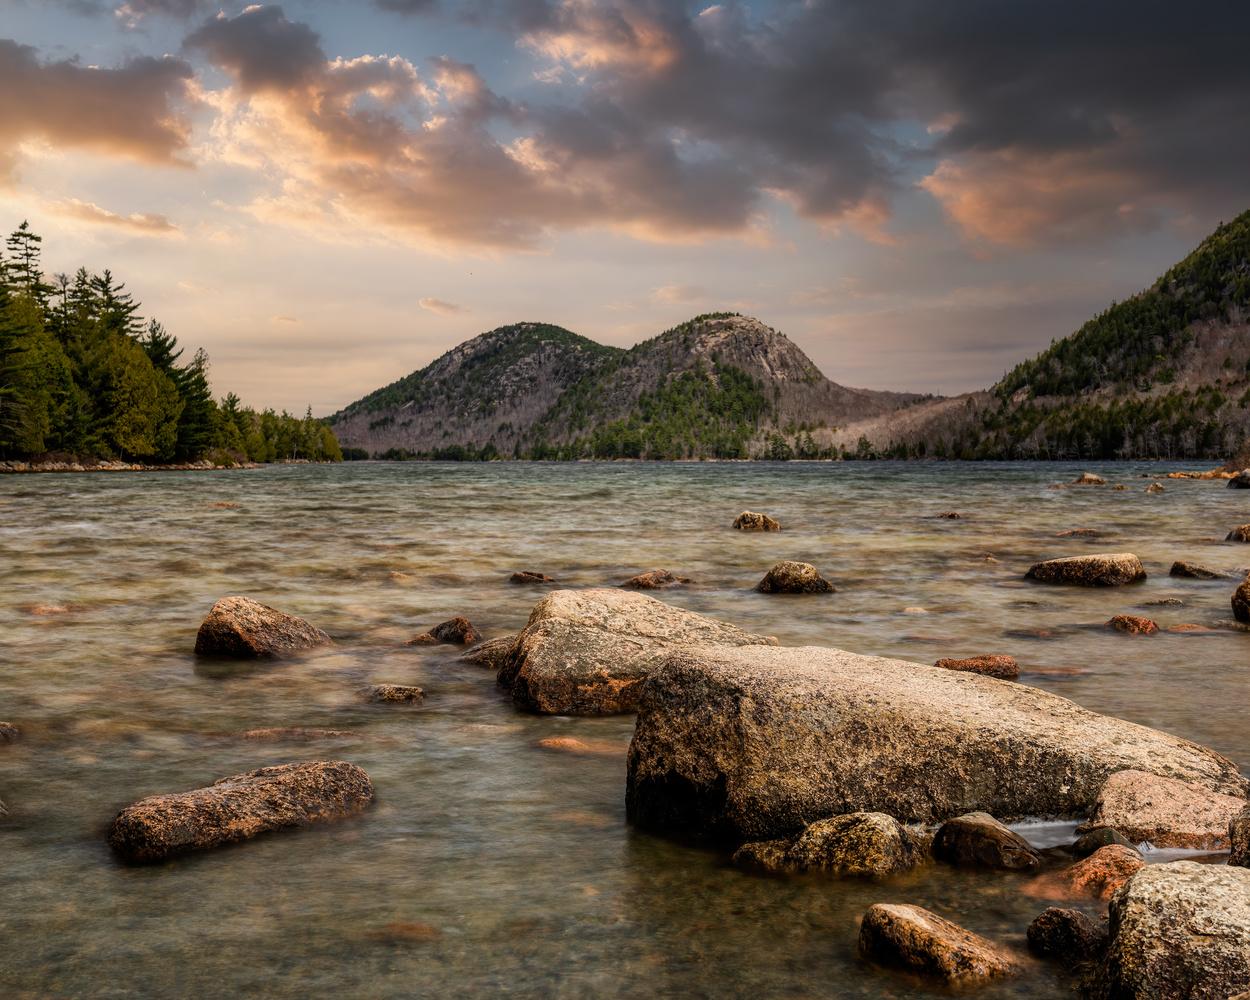 Jordan Pond, Acadia National Park, Maine USA by Skyler Ewing